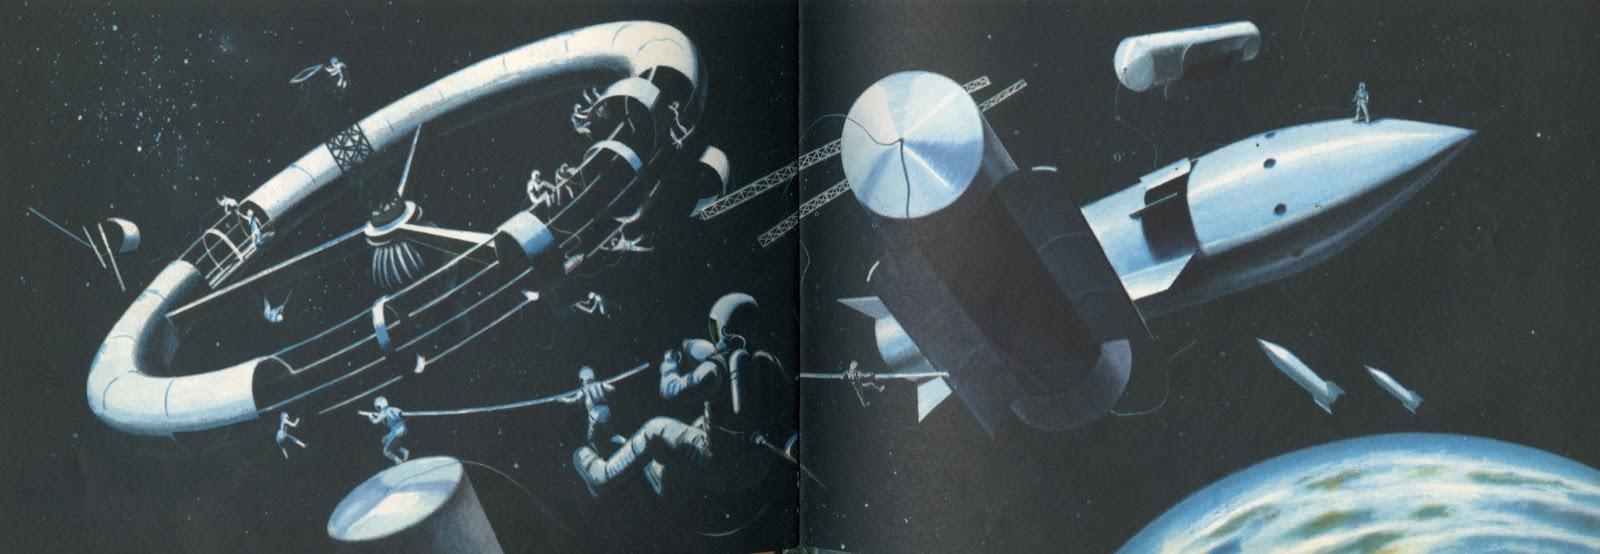 1958 space exploration - photo #6